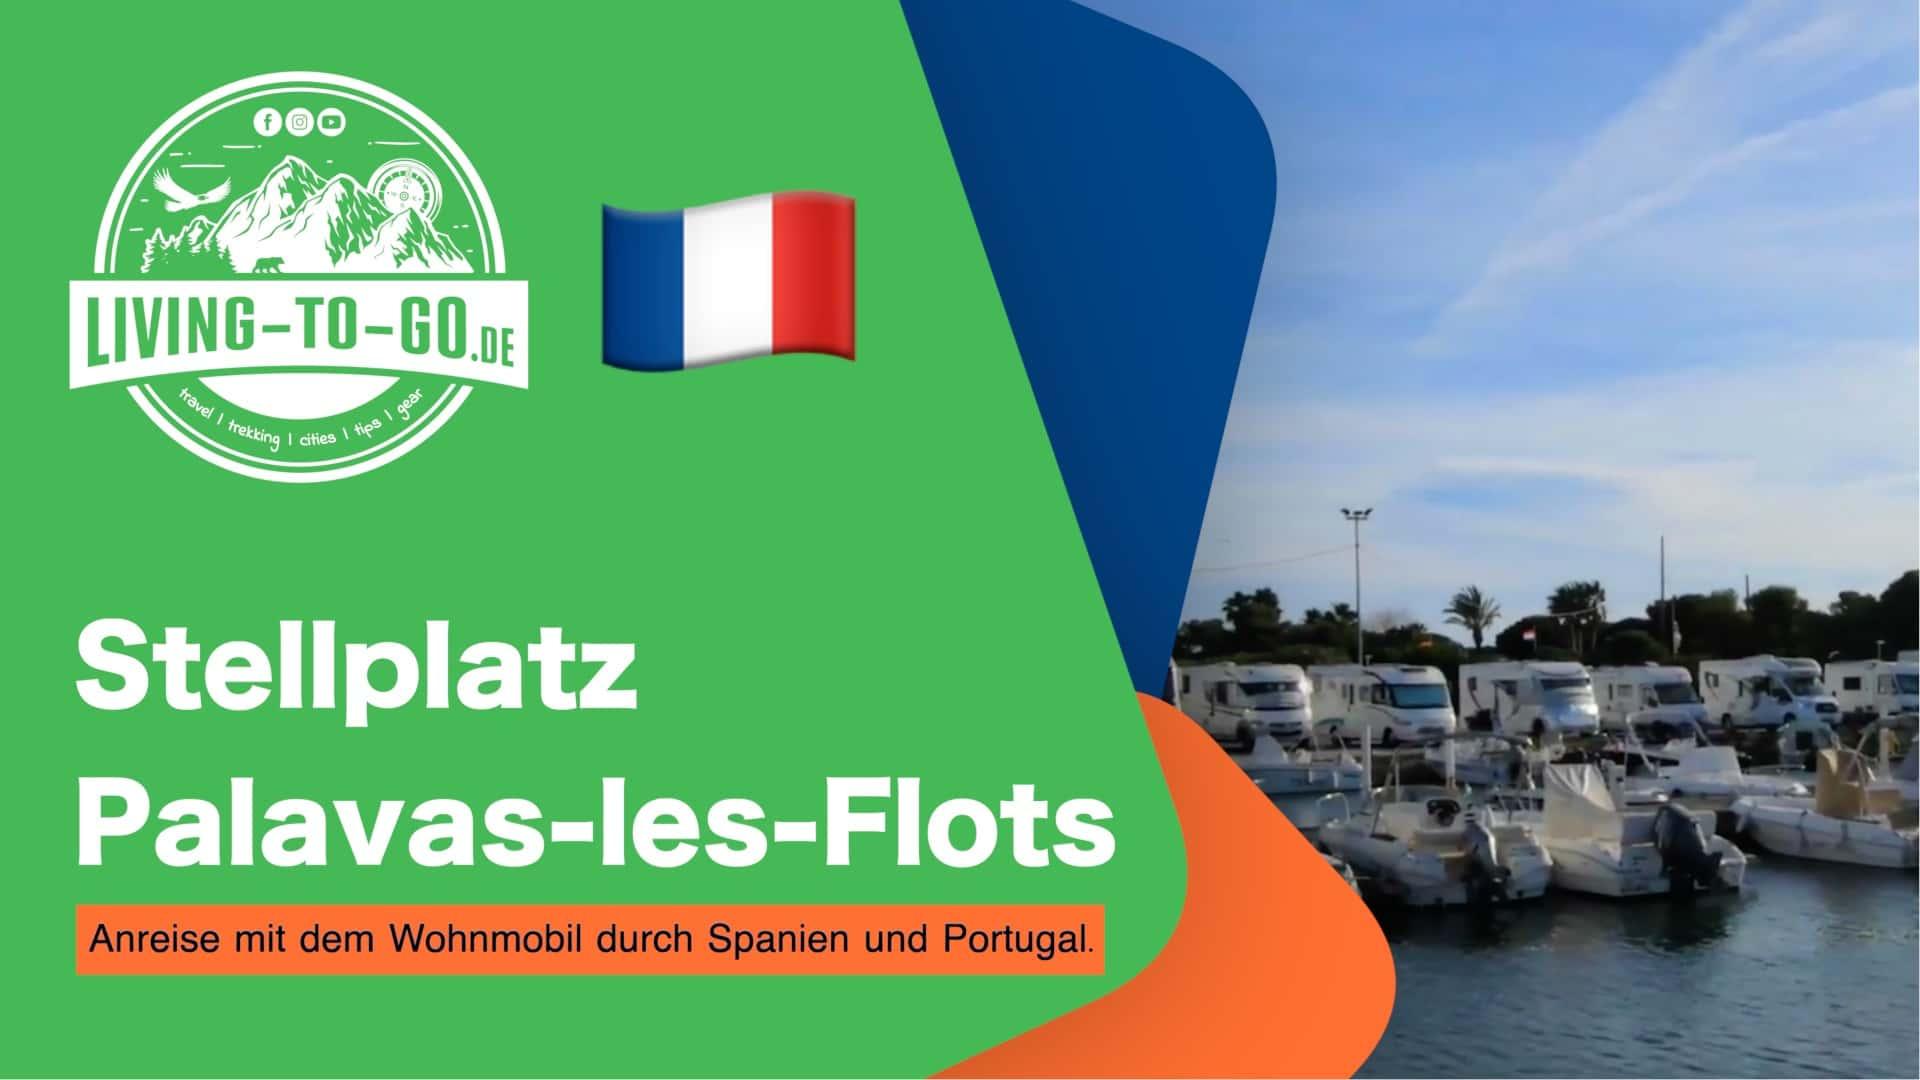 Stellplatz Palavas-les-Flots